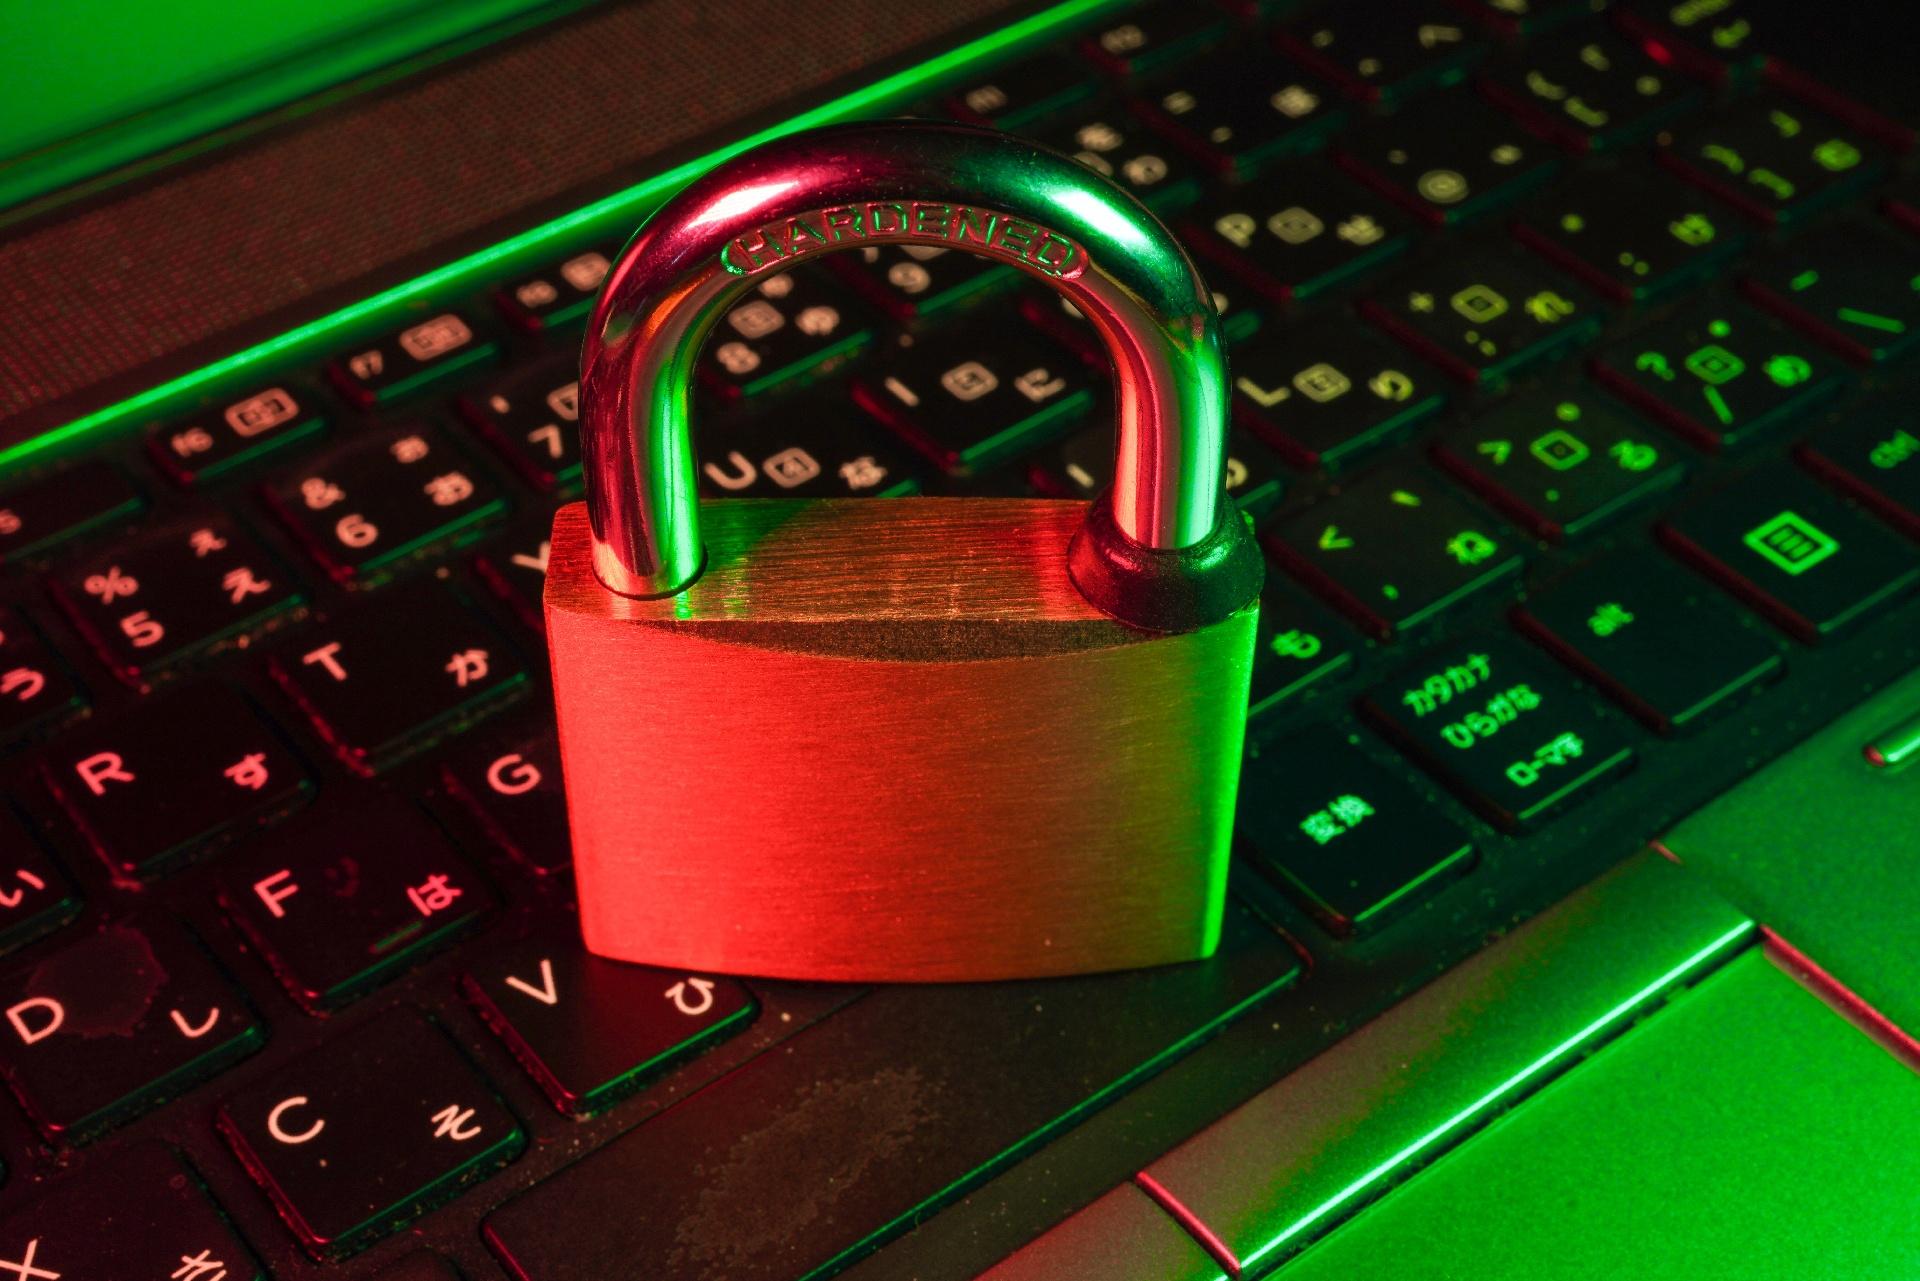 Cyber-Security-Anbieter punkten mit Swissness_cmm360_Photo by FLY:D on Unsplash